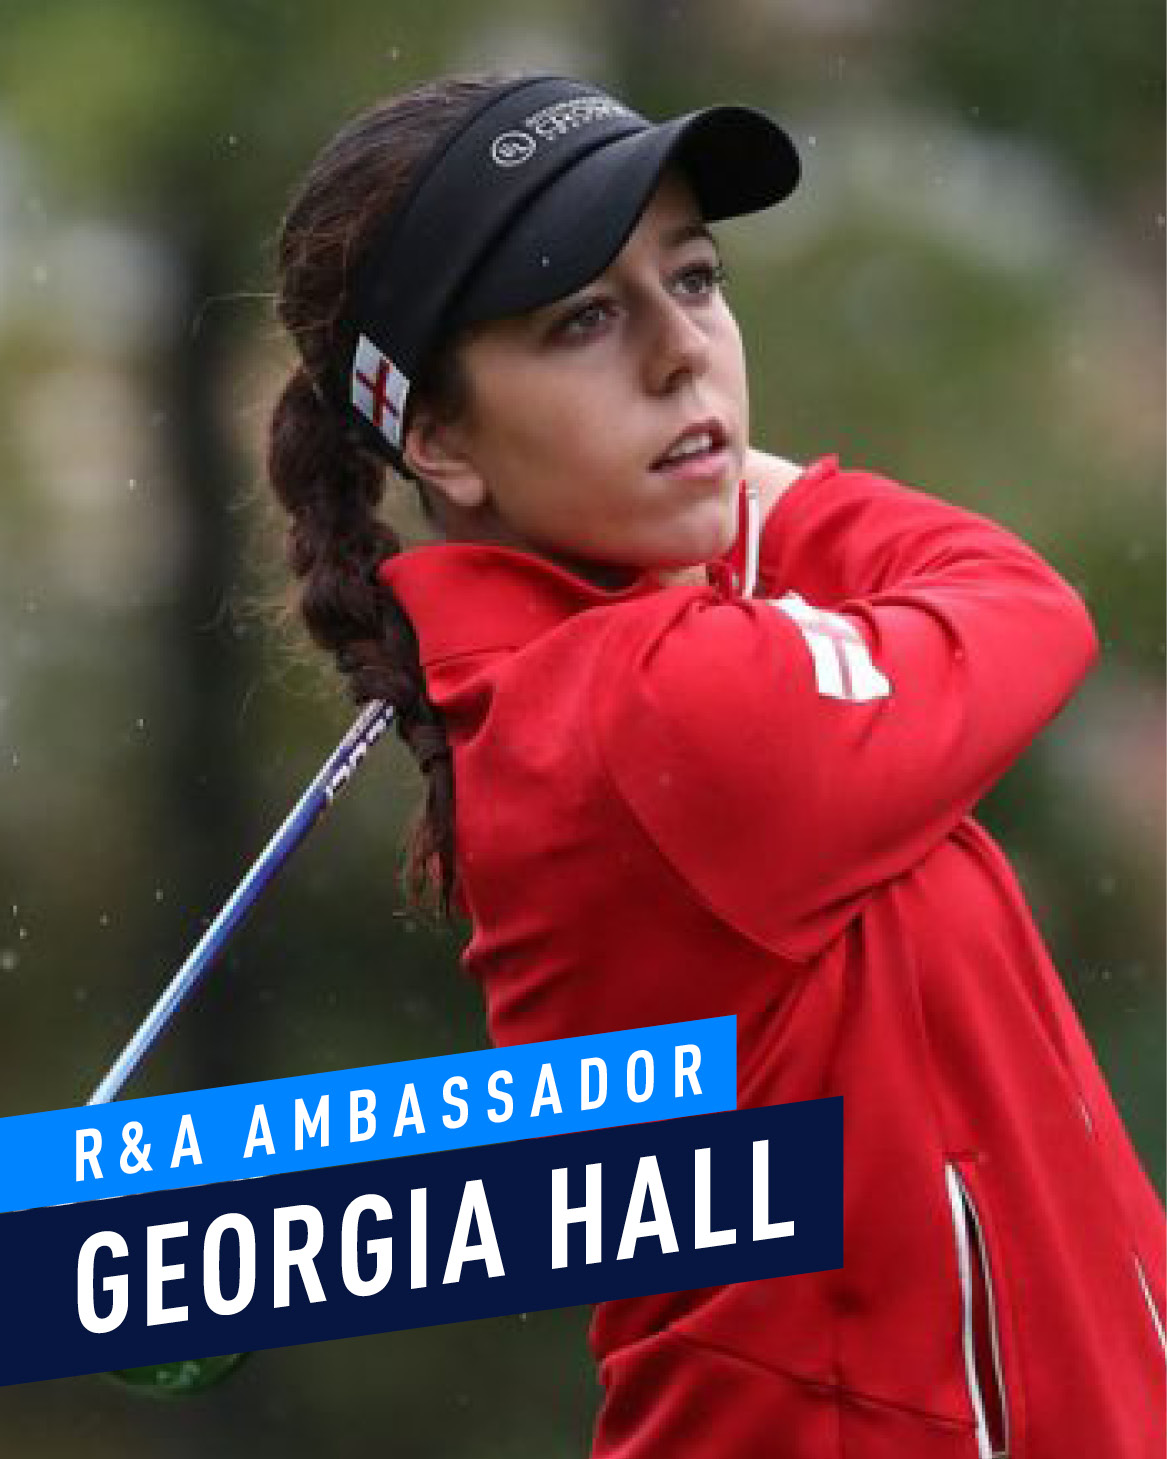 Georgia Hall